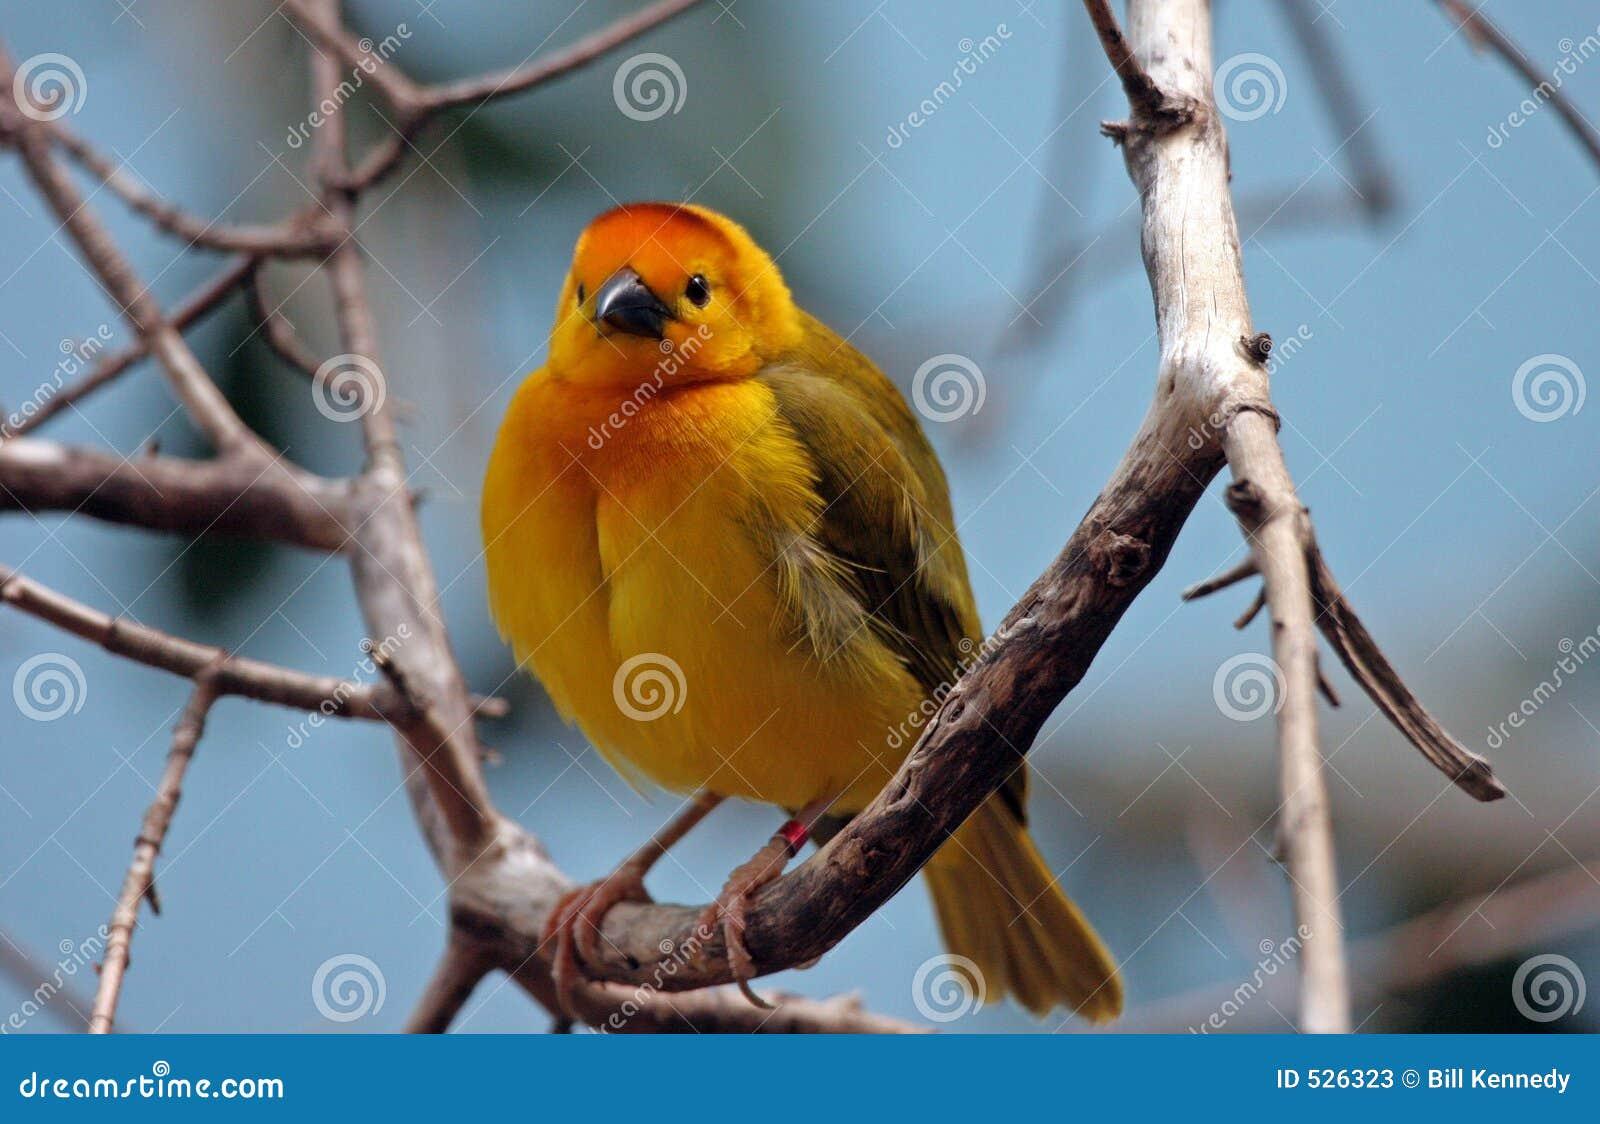 Download 逗人喜爱的雀科 库存图片. 图片 包括有 黄色, 本质, 公开承认, 栖息, 羽毛, 双翼飞机, 烧杯, 残破 - 526323